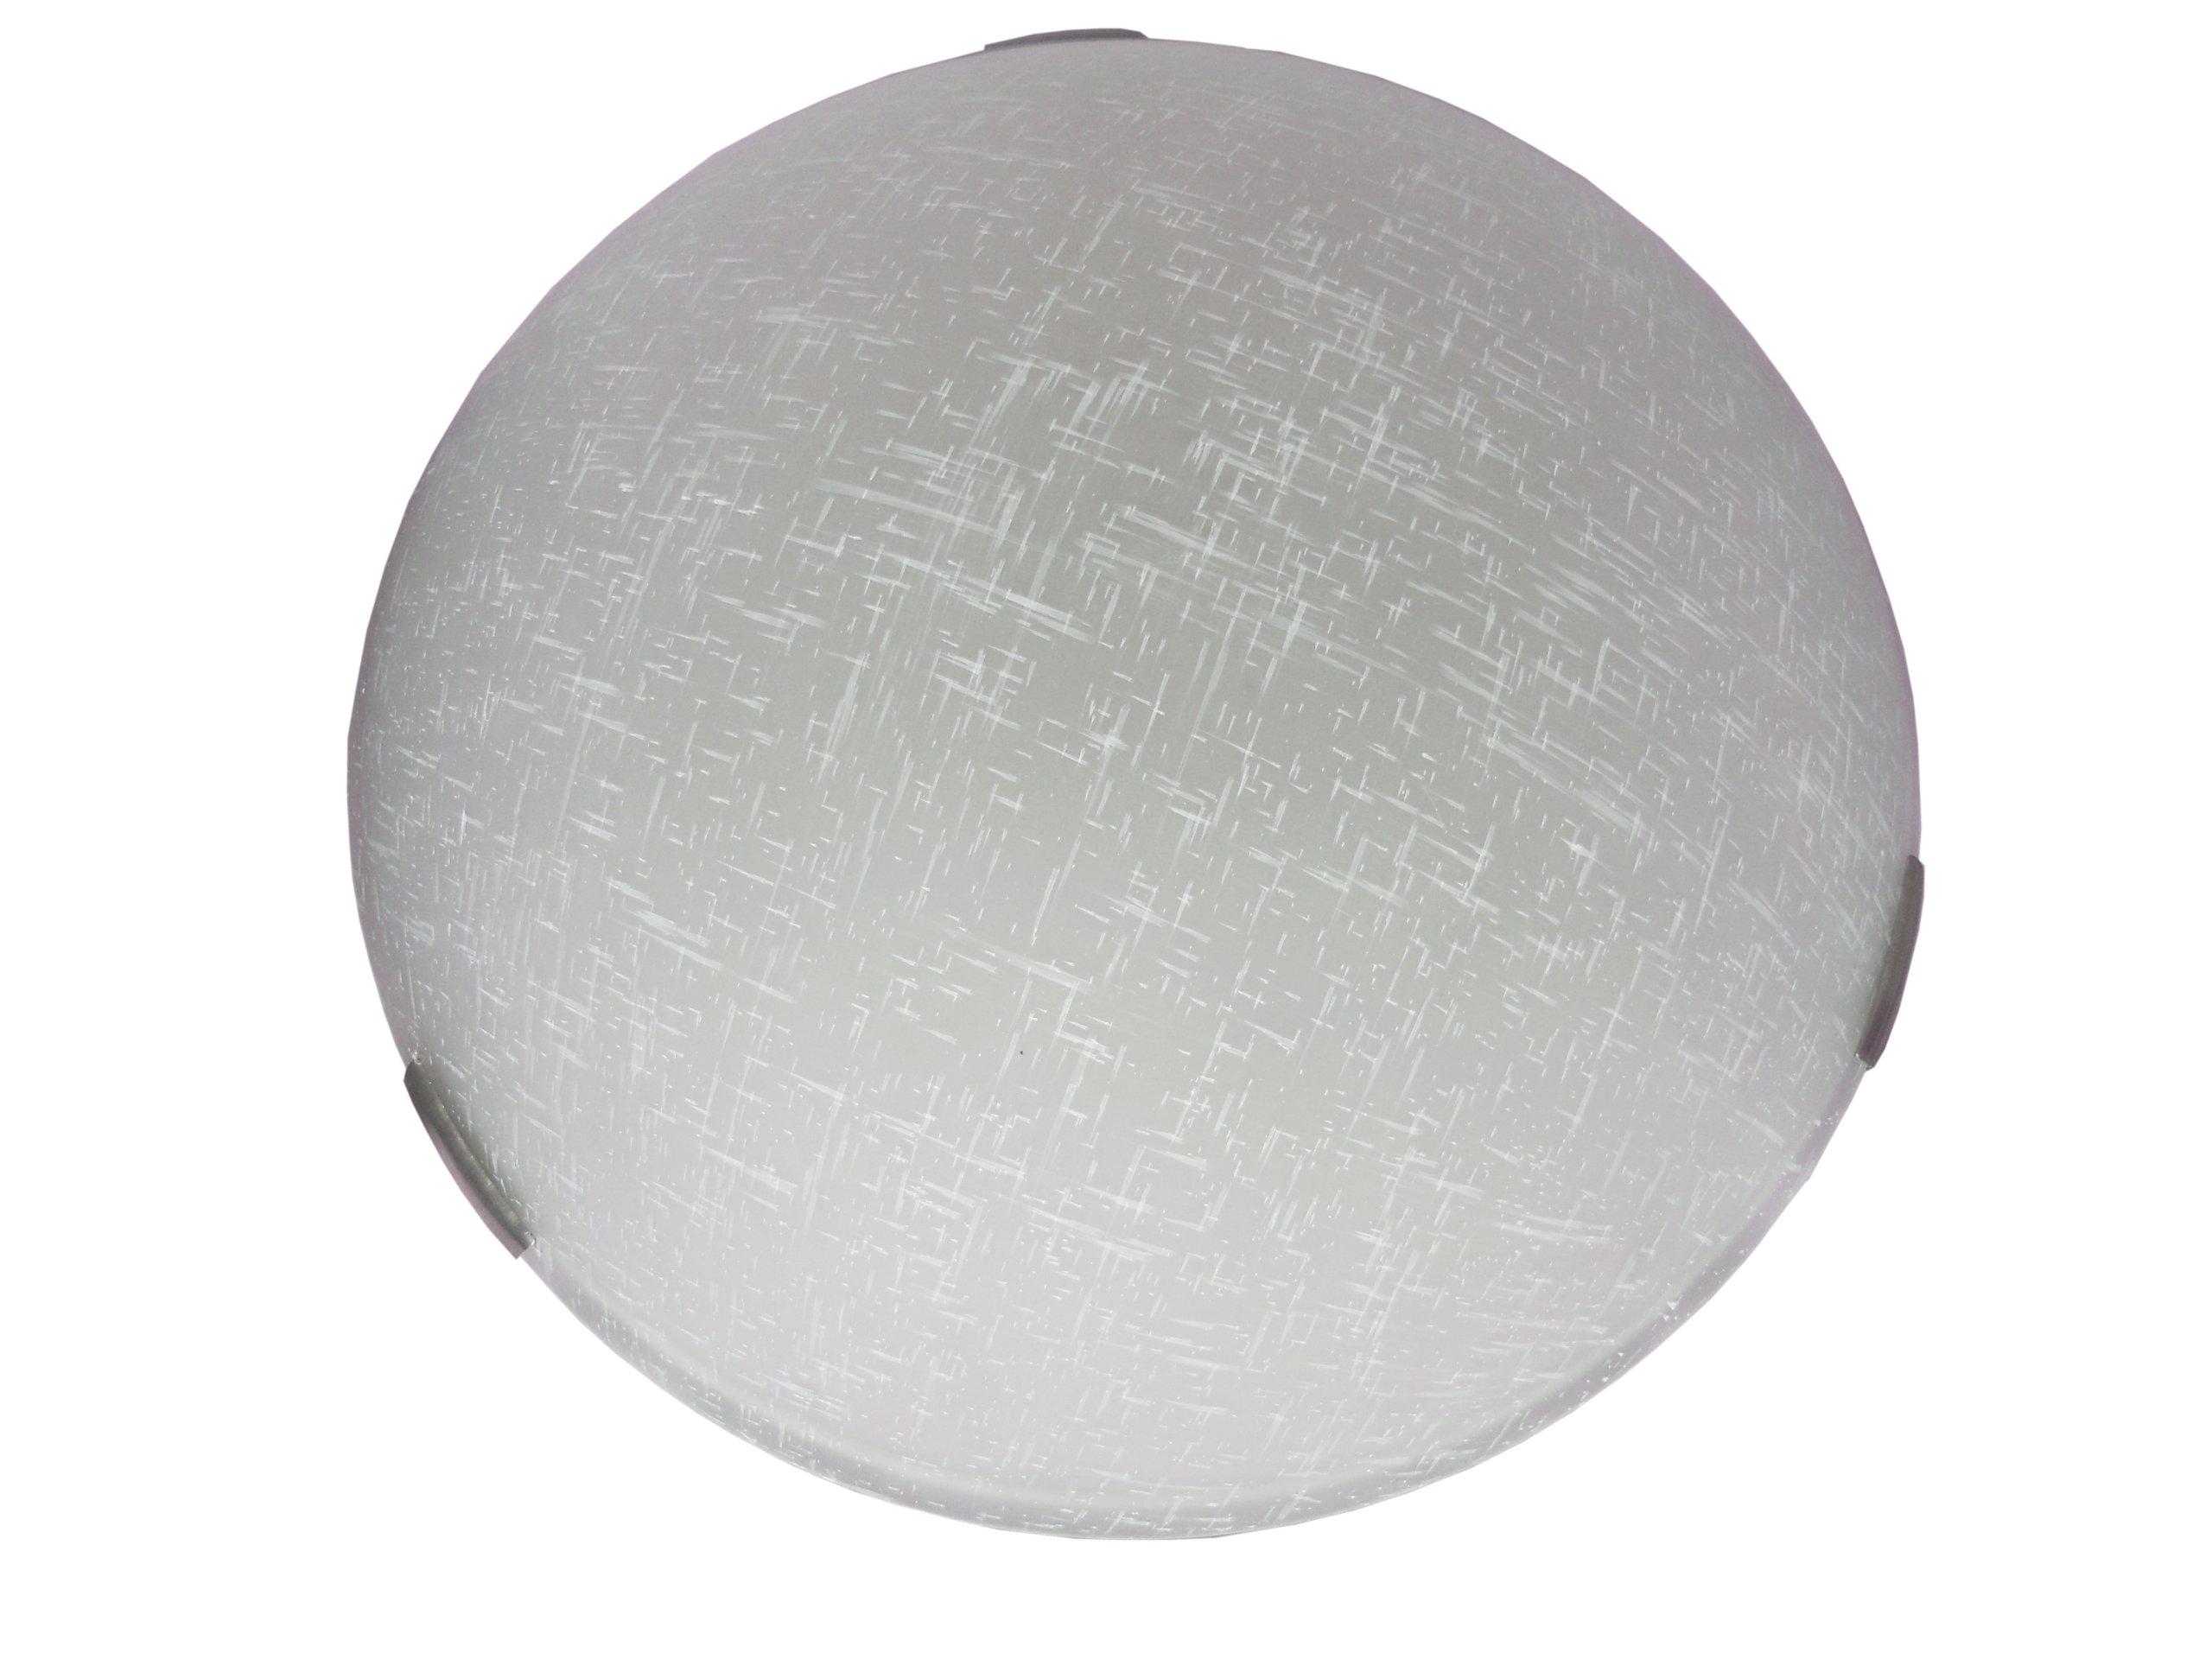 Whitfield ESFM389-16WLNSS Alexander 16-Inch Energy Star Three-Light Flush Mount, Satin Steel with White Linen Glass